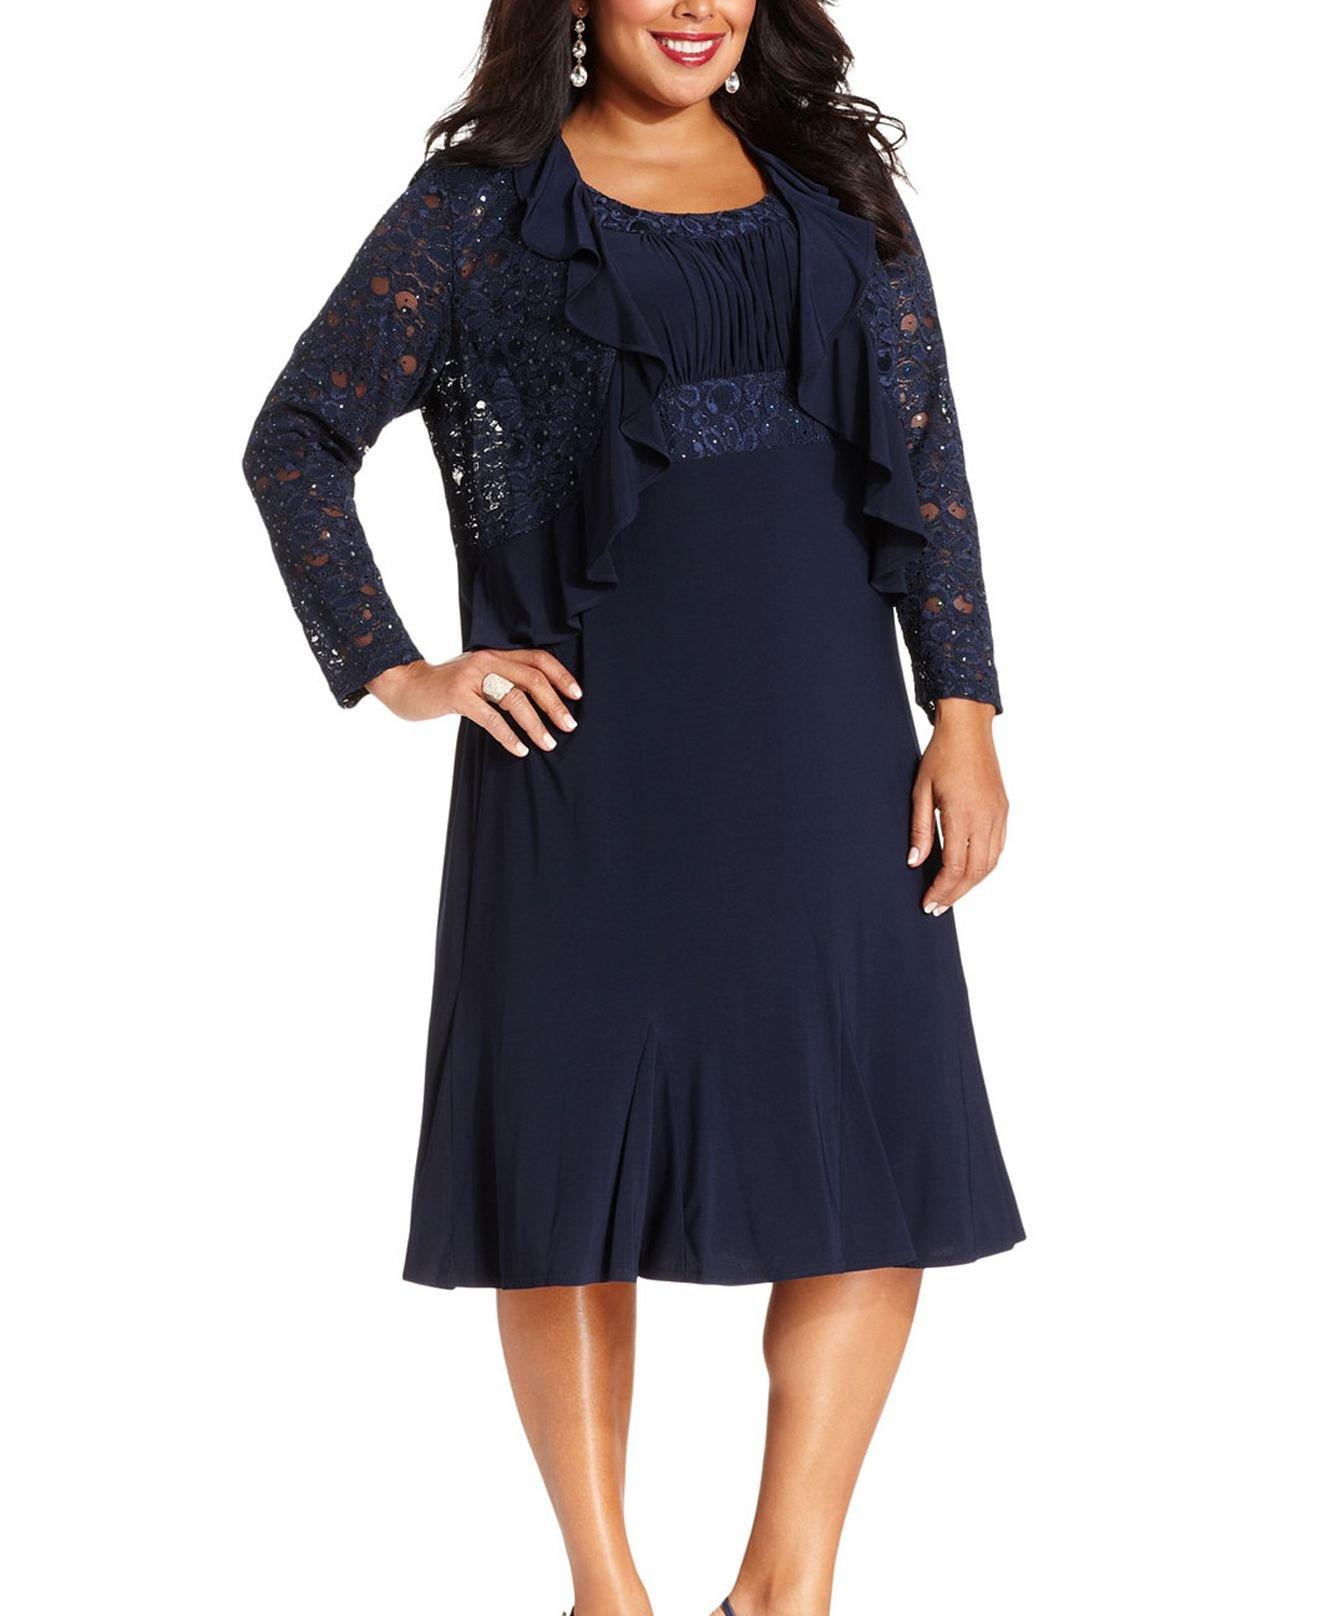 77343ee9c131d ... Dresses RM Richards Women s Plus Size Sequin Lace Ruffle Jacket Dress –  Mother of The Bride Wedding Dresses – Navy 22W.   